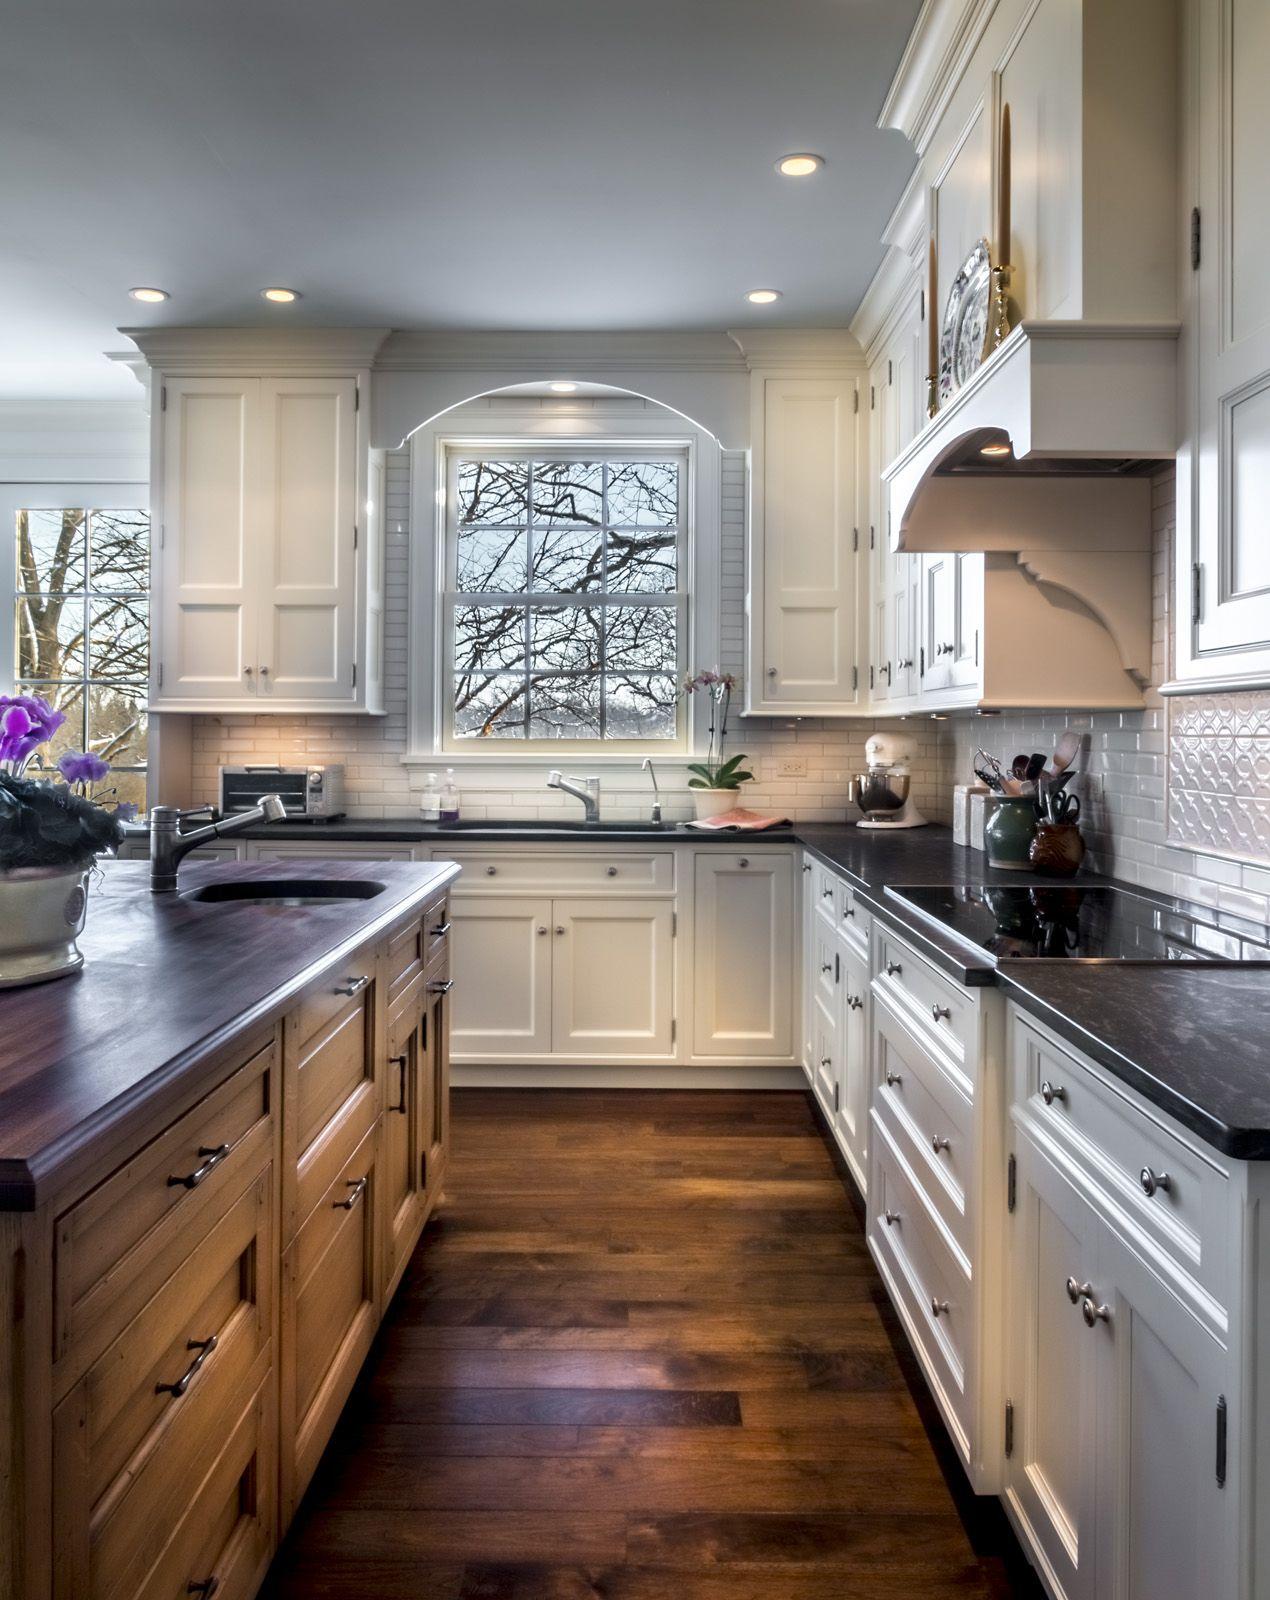 Casual Yet Refined Kitchen Design Kitchen Cabinet Remodel Discount Kitchen Cabinets